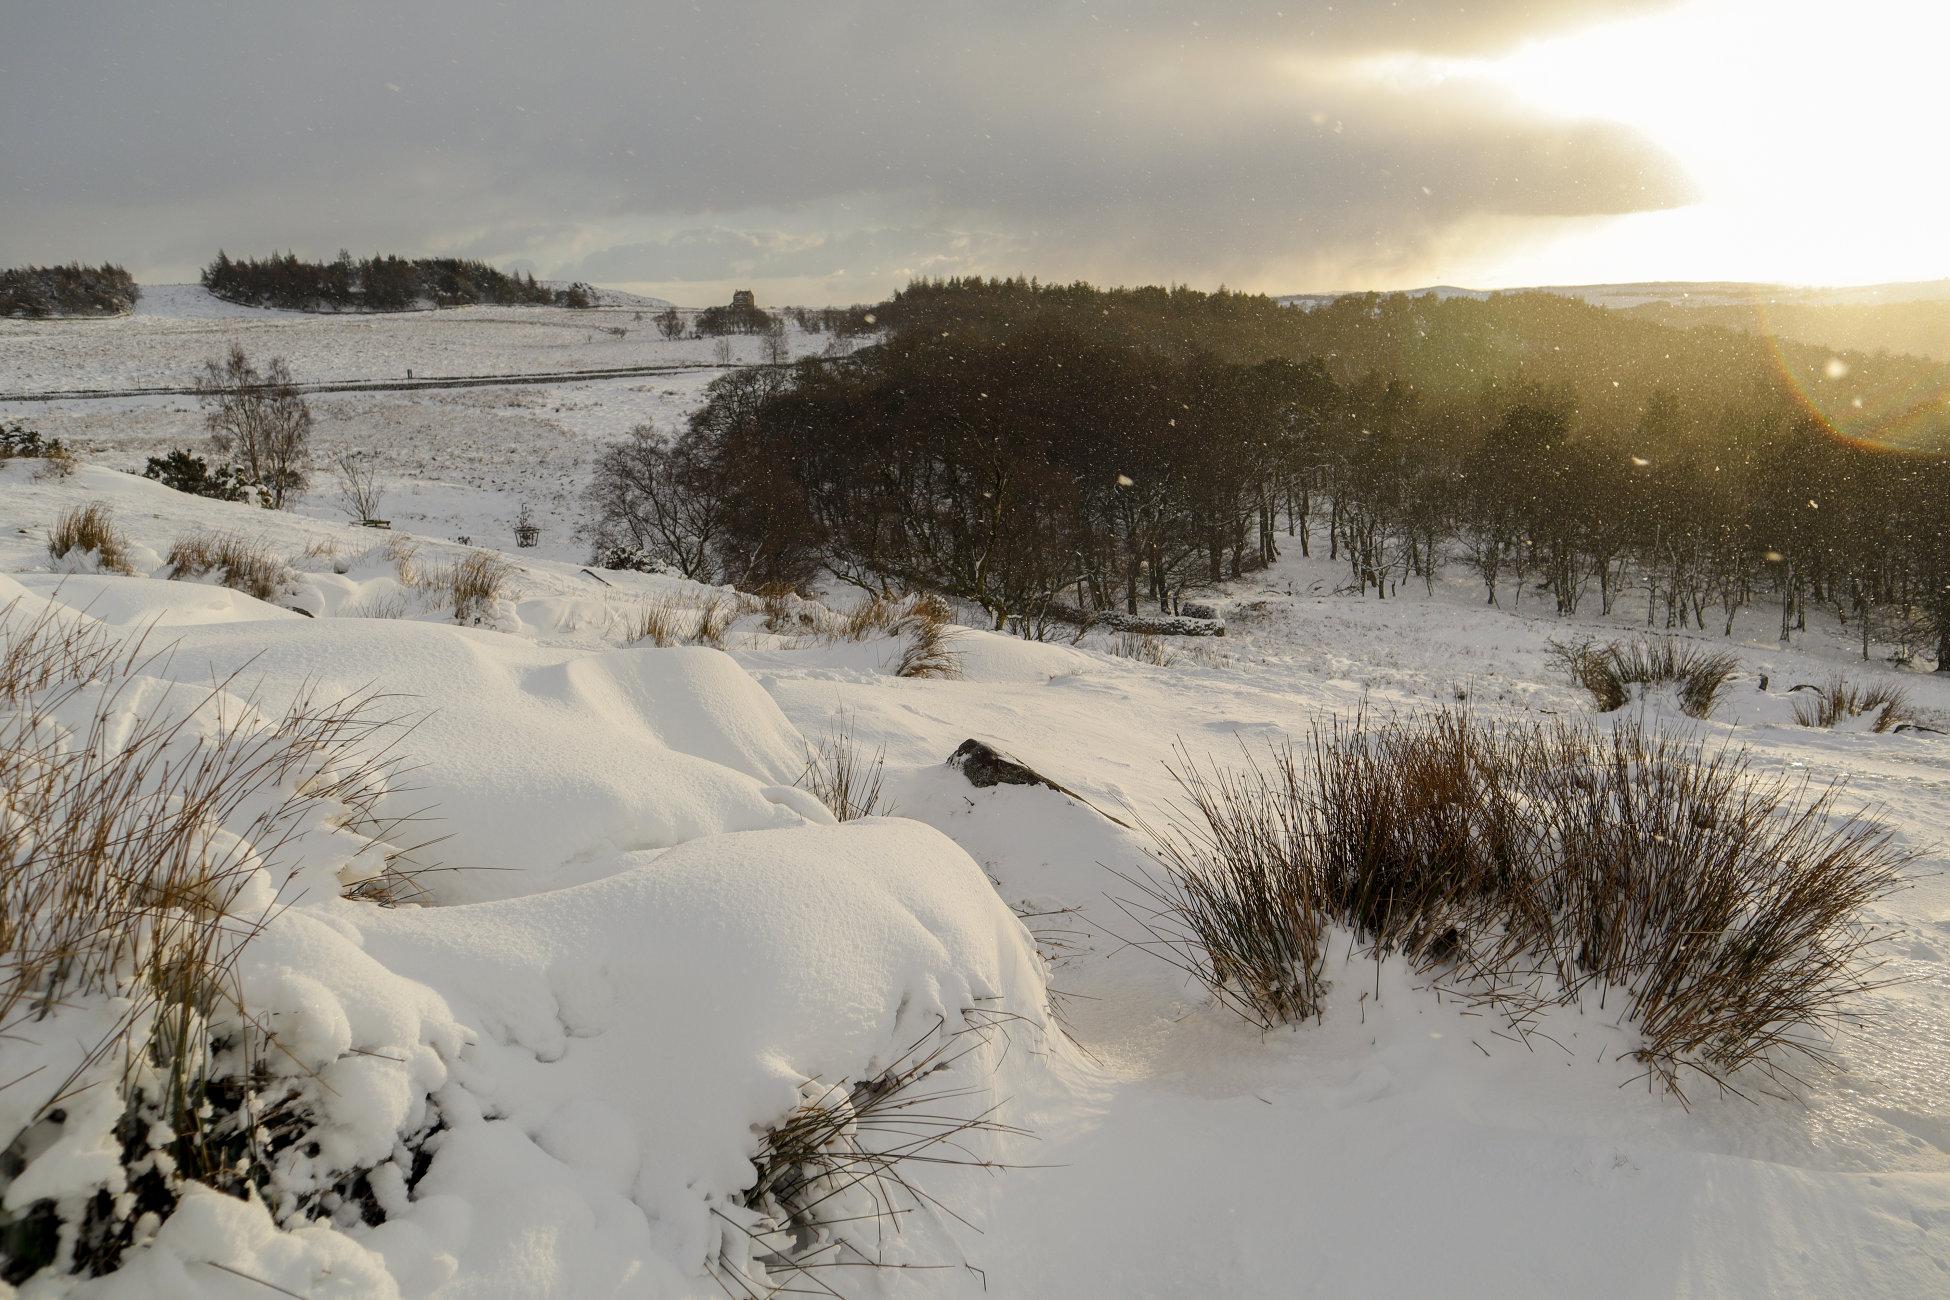 Derbyshire snows